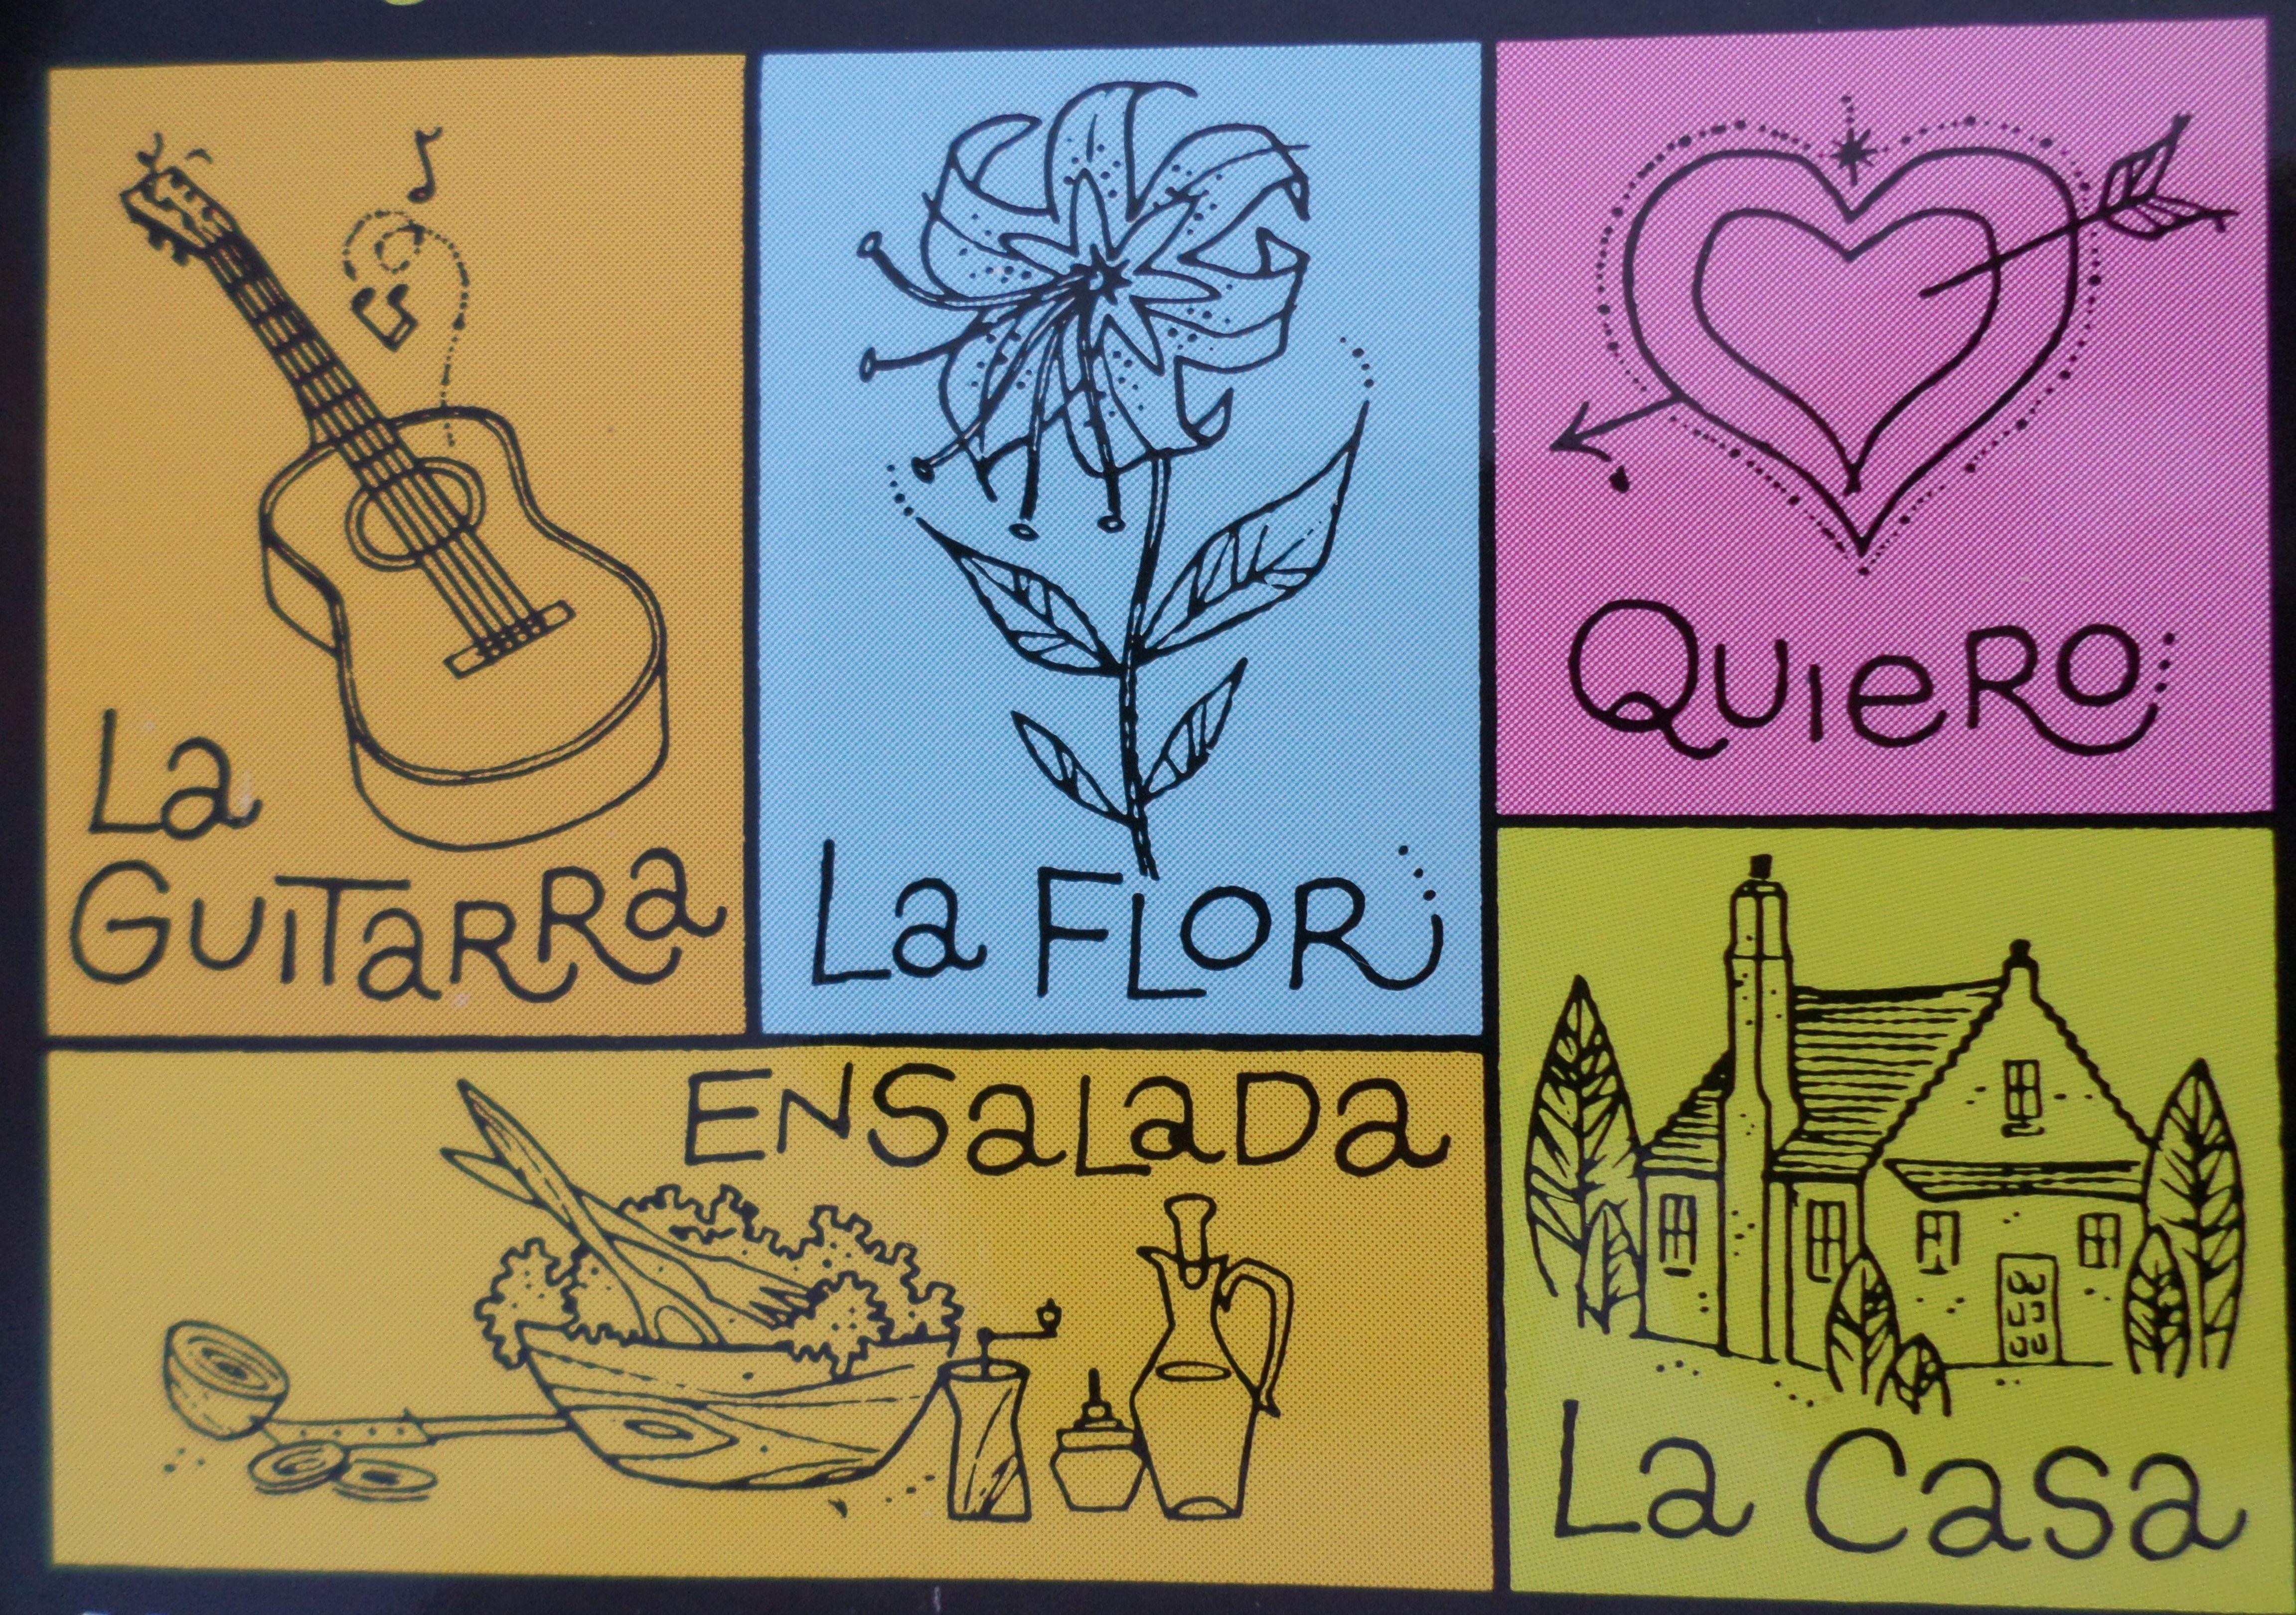 Syracuse Spanish Language Meetup Group